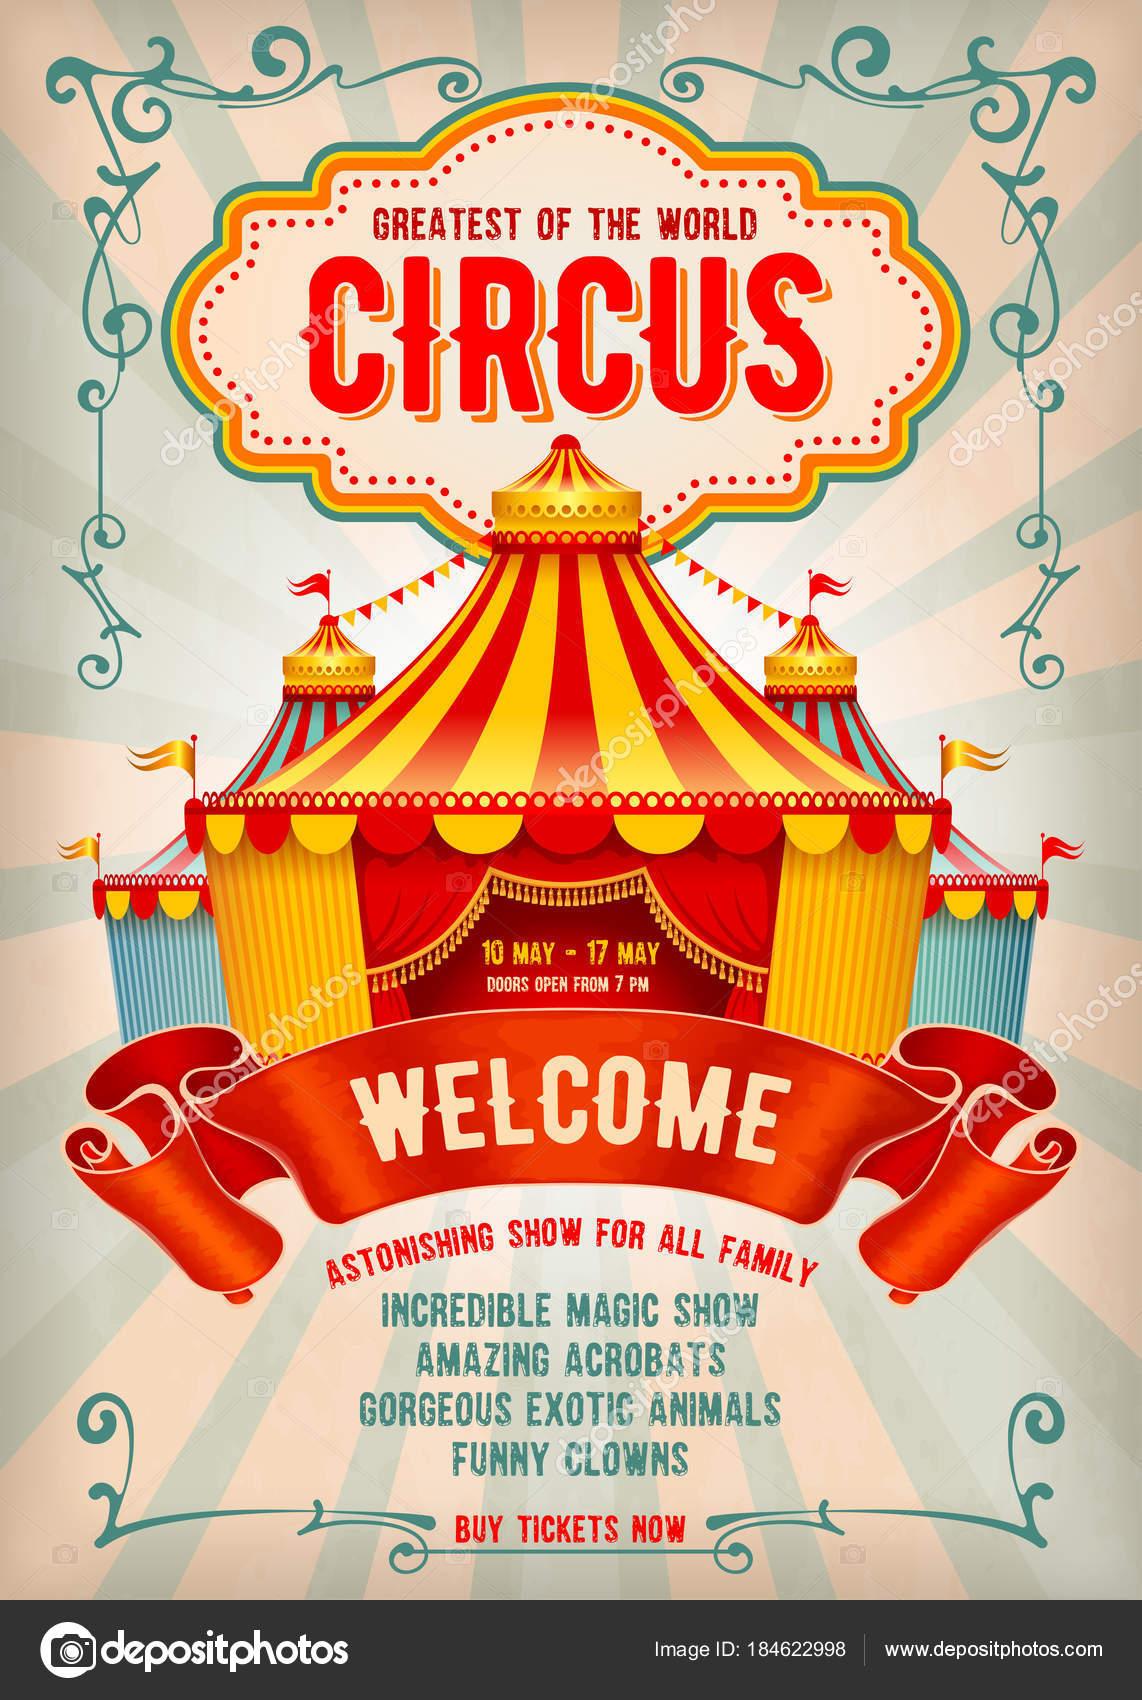 https://st3.depositphotos.com/1903923/18462/v/1600/depositphotos_184622998-stock-illustration-circus-advertising-poster.jpg